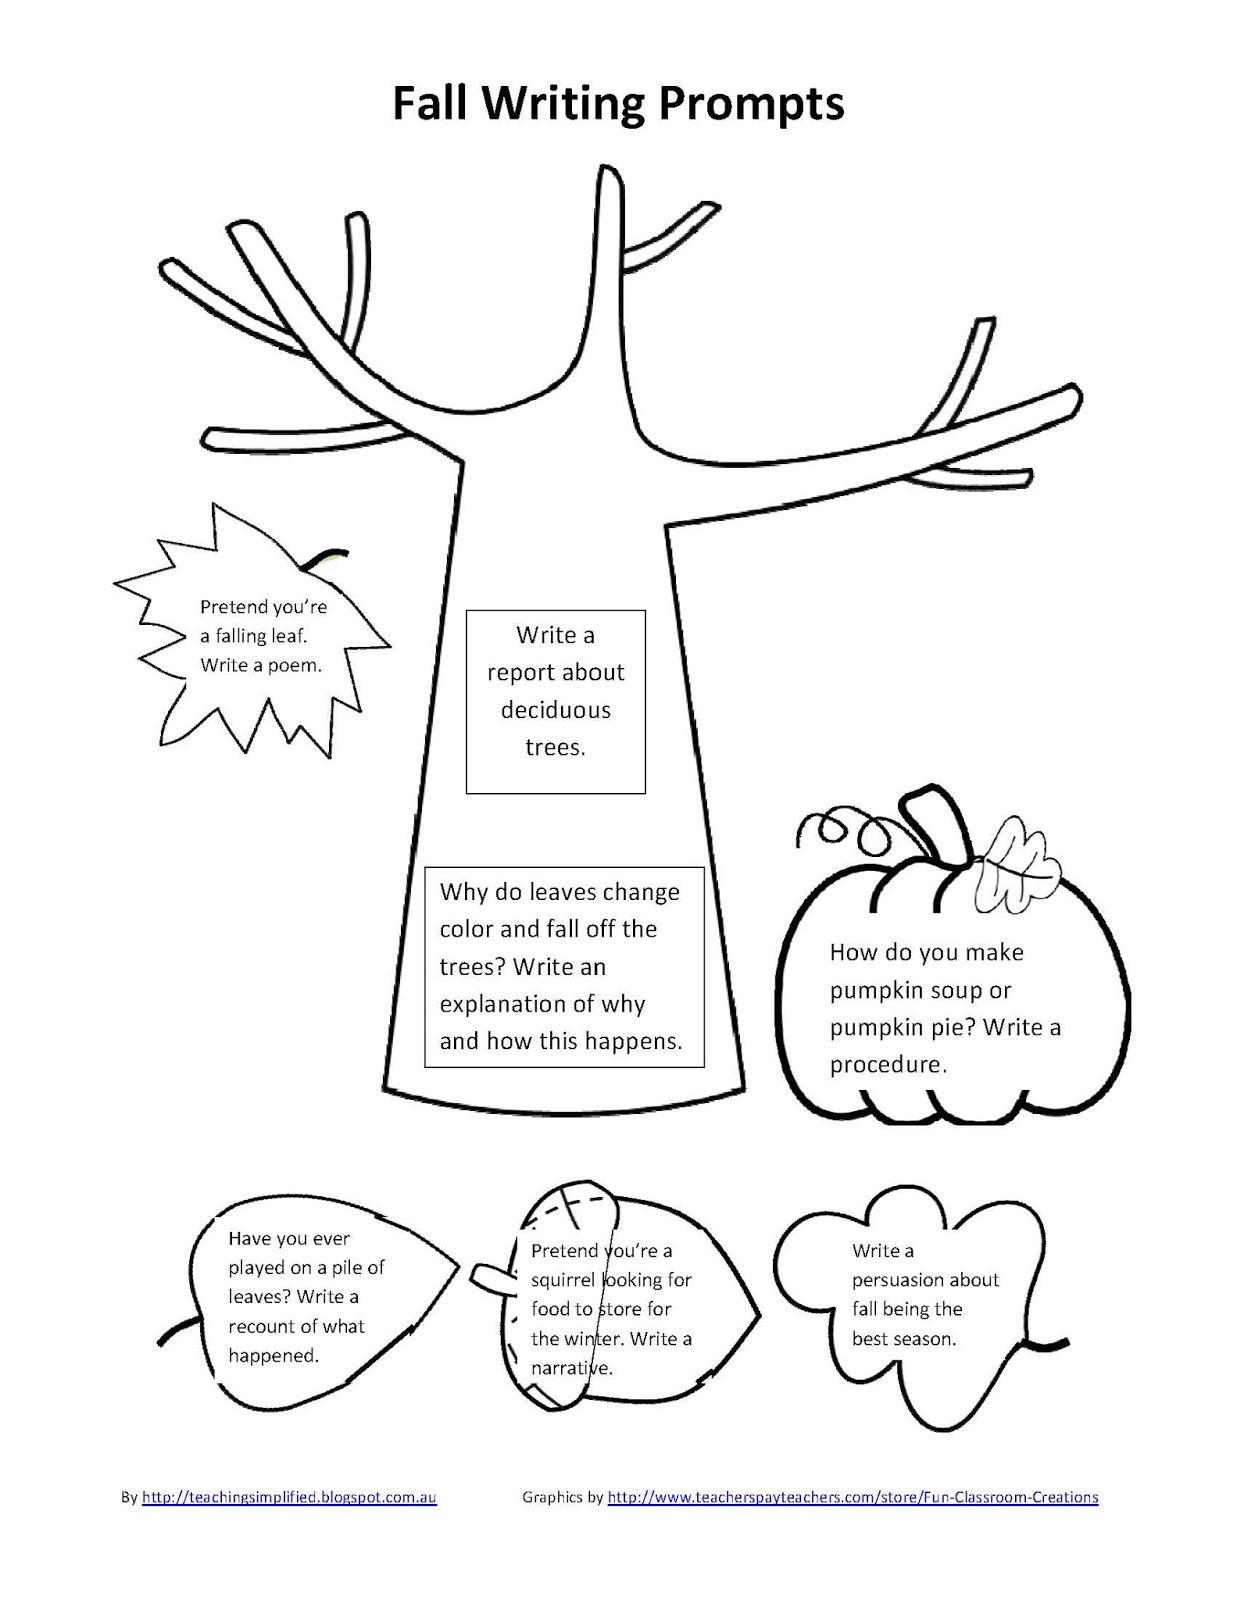 Saxon Math Kindergarten Worksheets Ilma Education Spring and Fall Writing Prompts Sheets